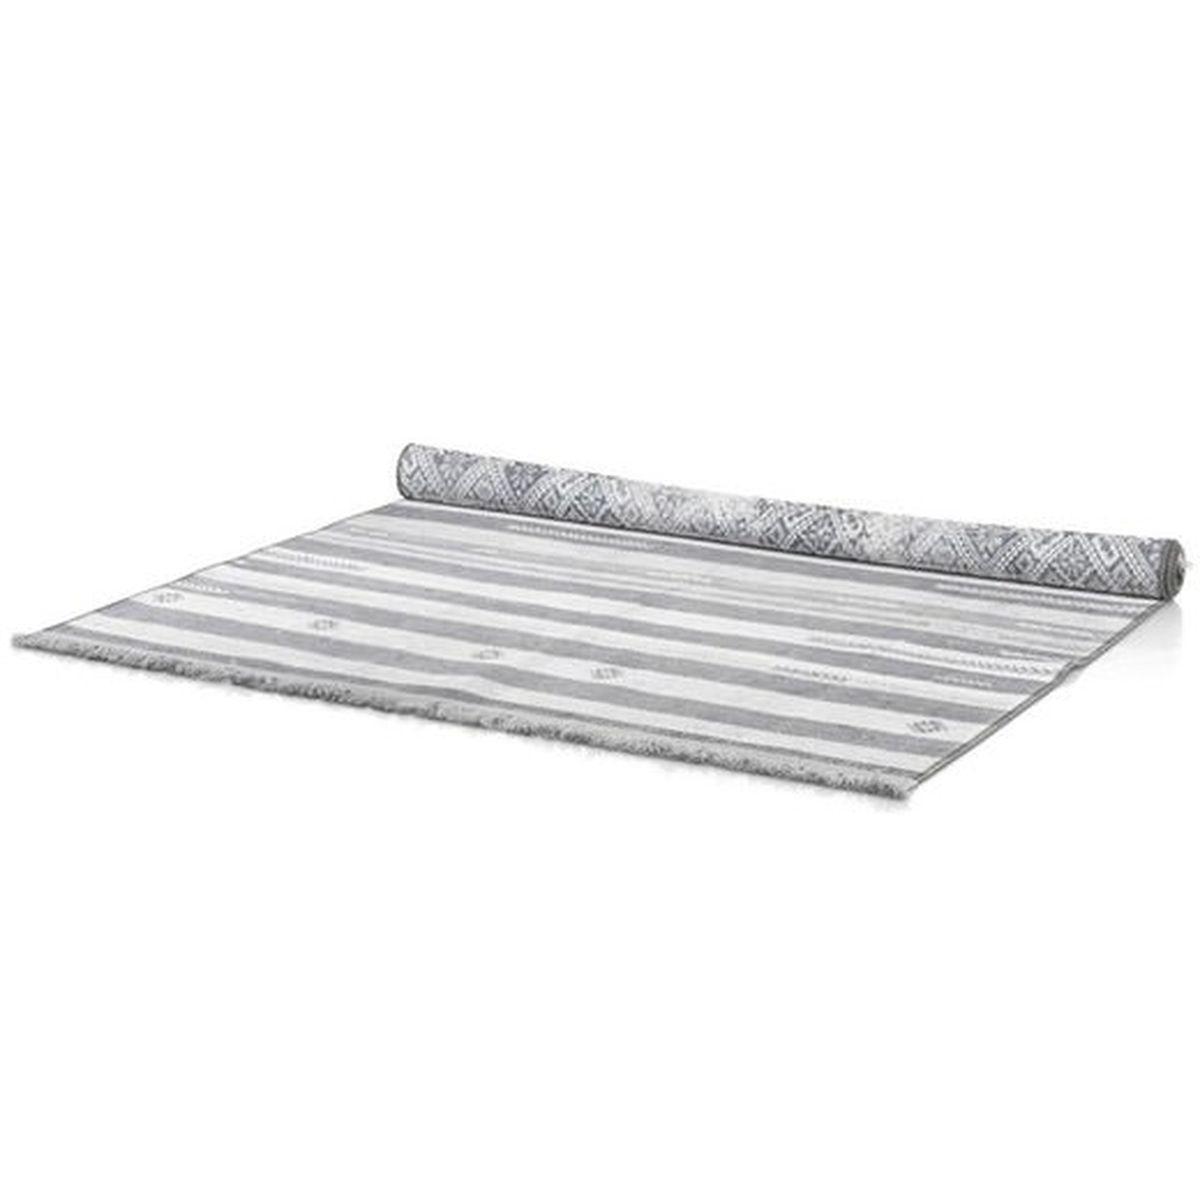 Tapis 230x160cm MOROCCO DOUBLE Coco Maison gris